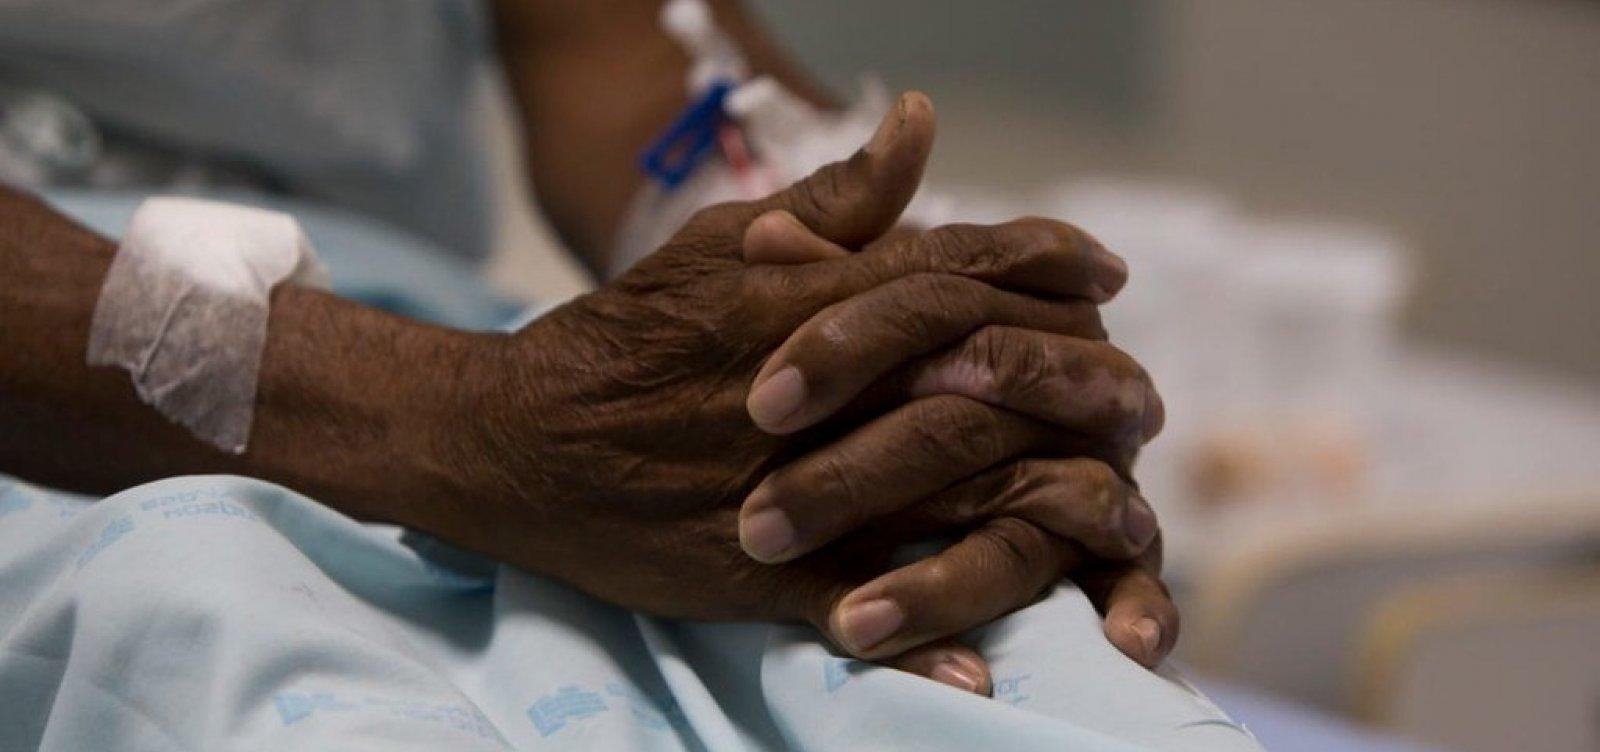 [Brasil ultrapassa 261 mil mortes por Covid-19, diz consórcio de imprensa]